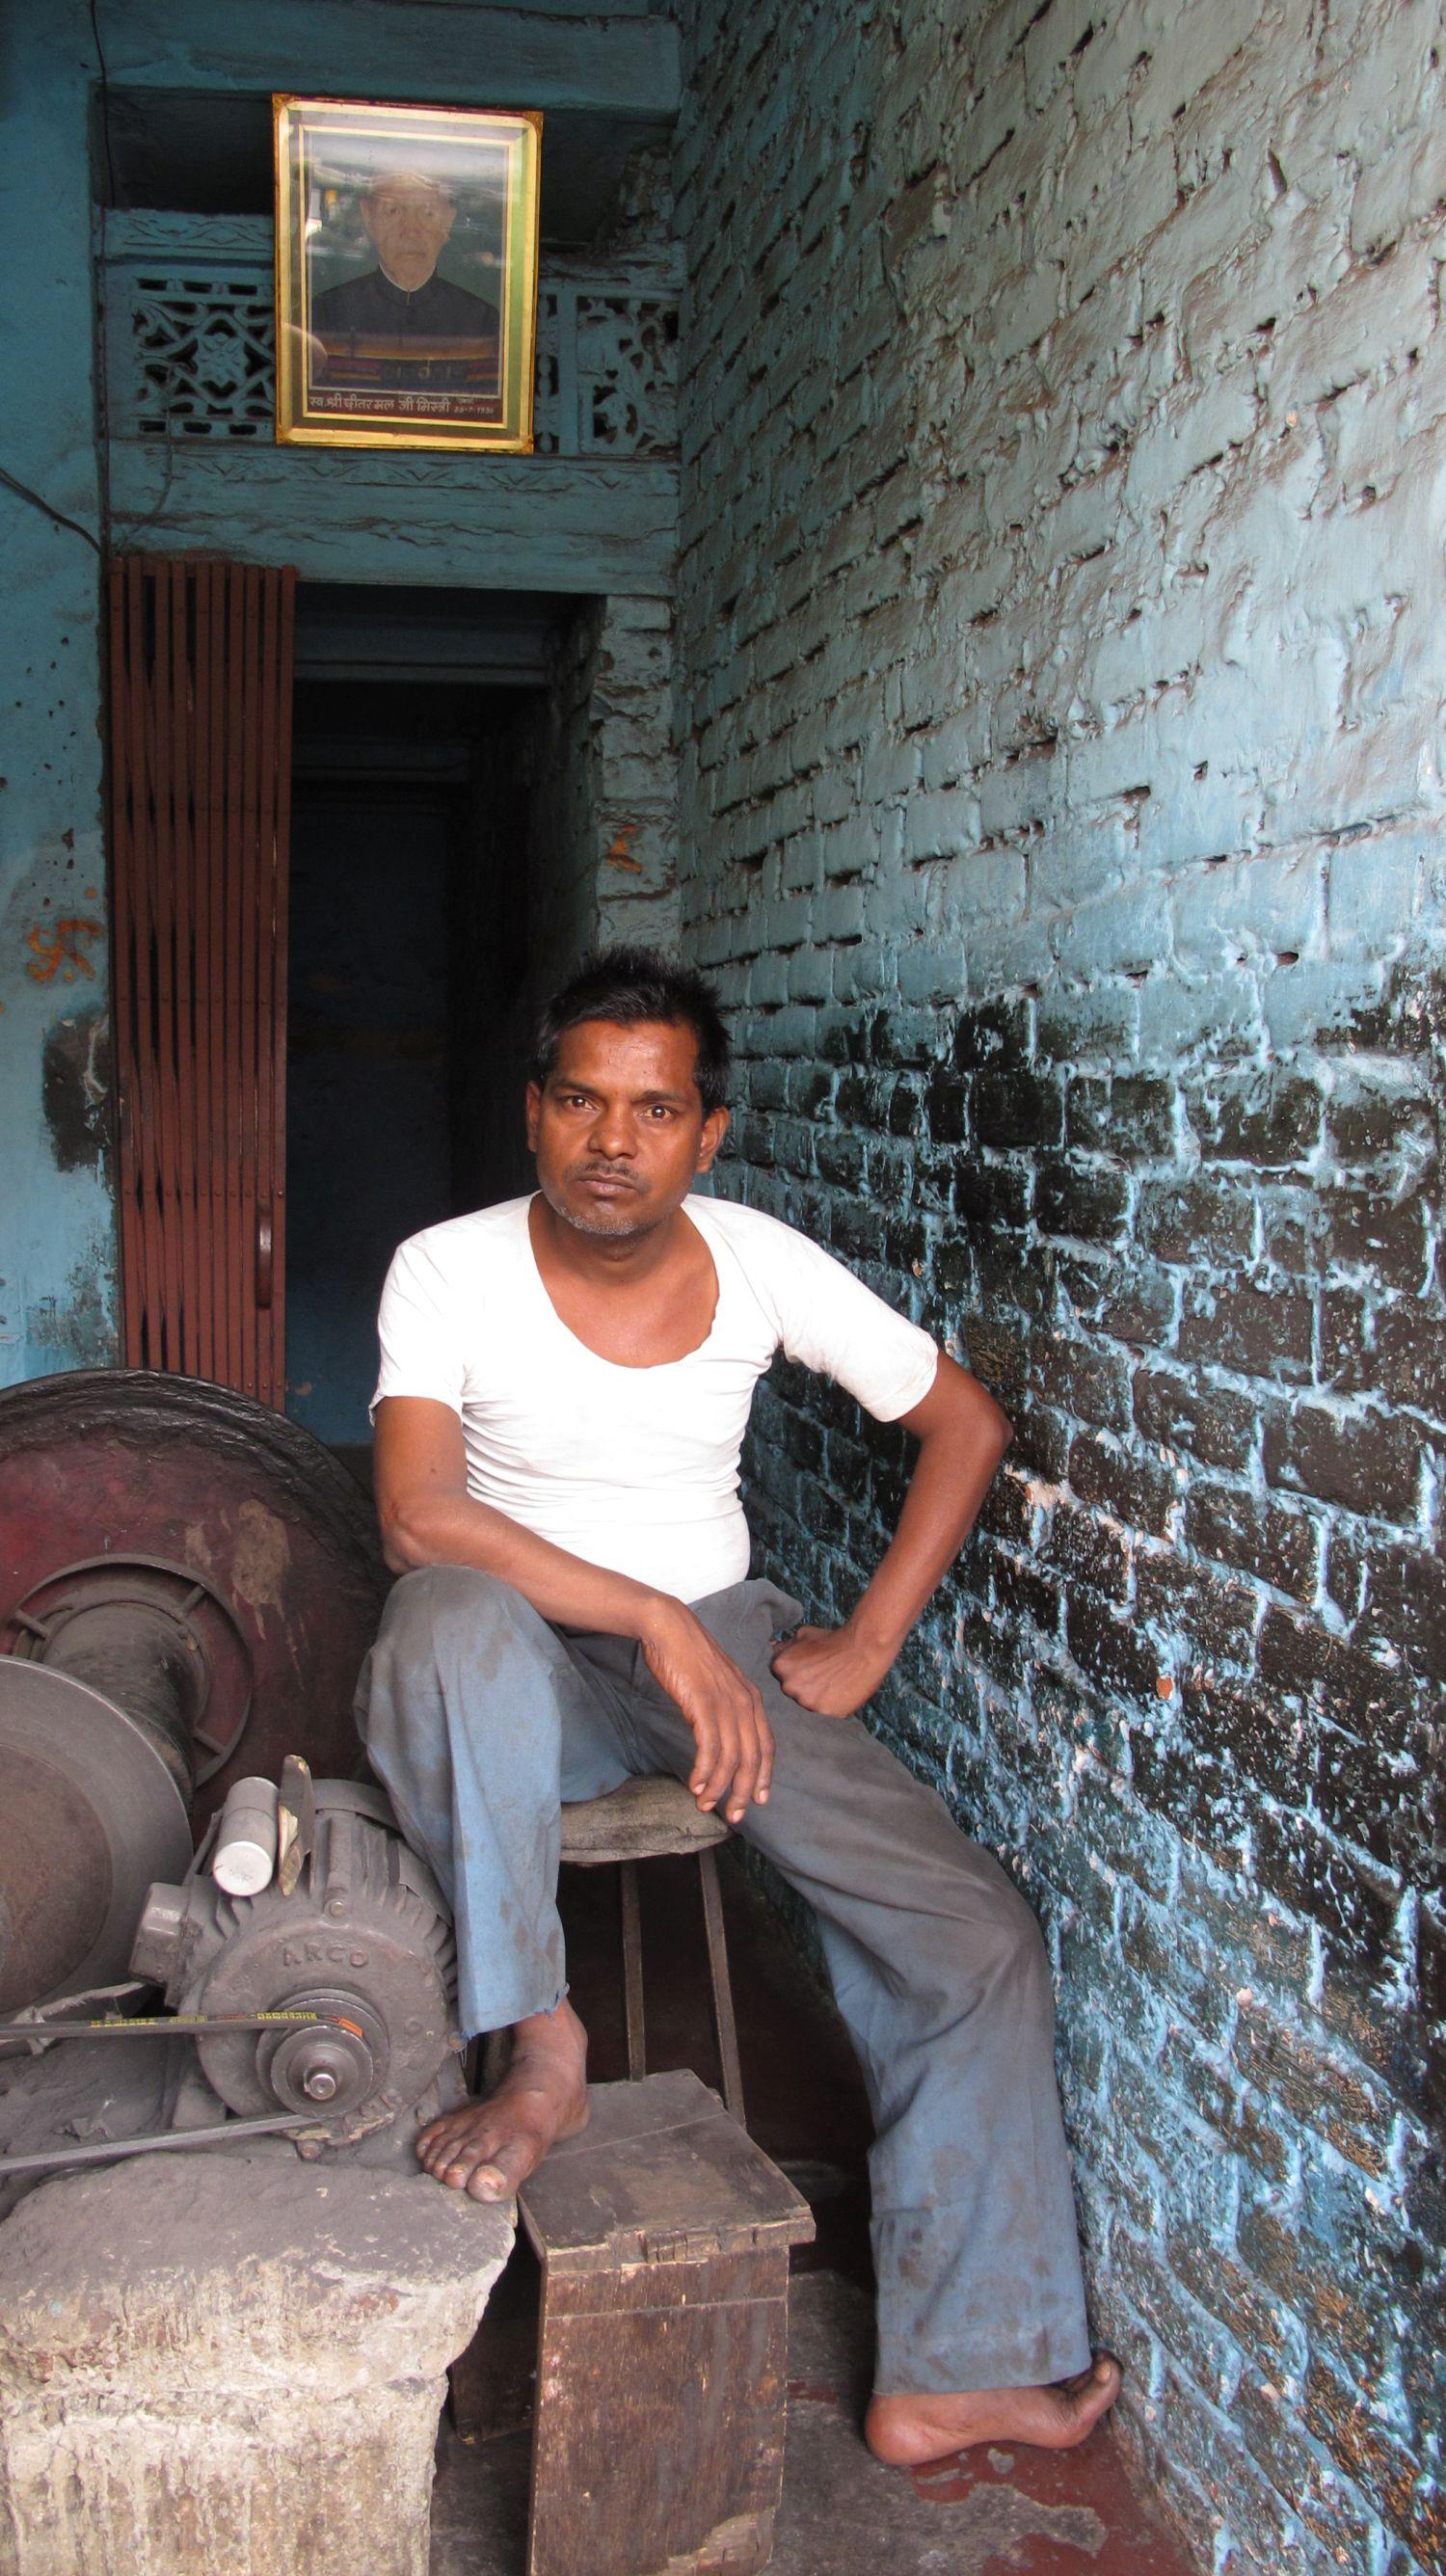 Jaipur | Pink city | Rajasthan | Indian worker | Blue wall | ©sandrine cohen